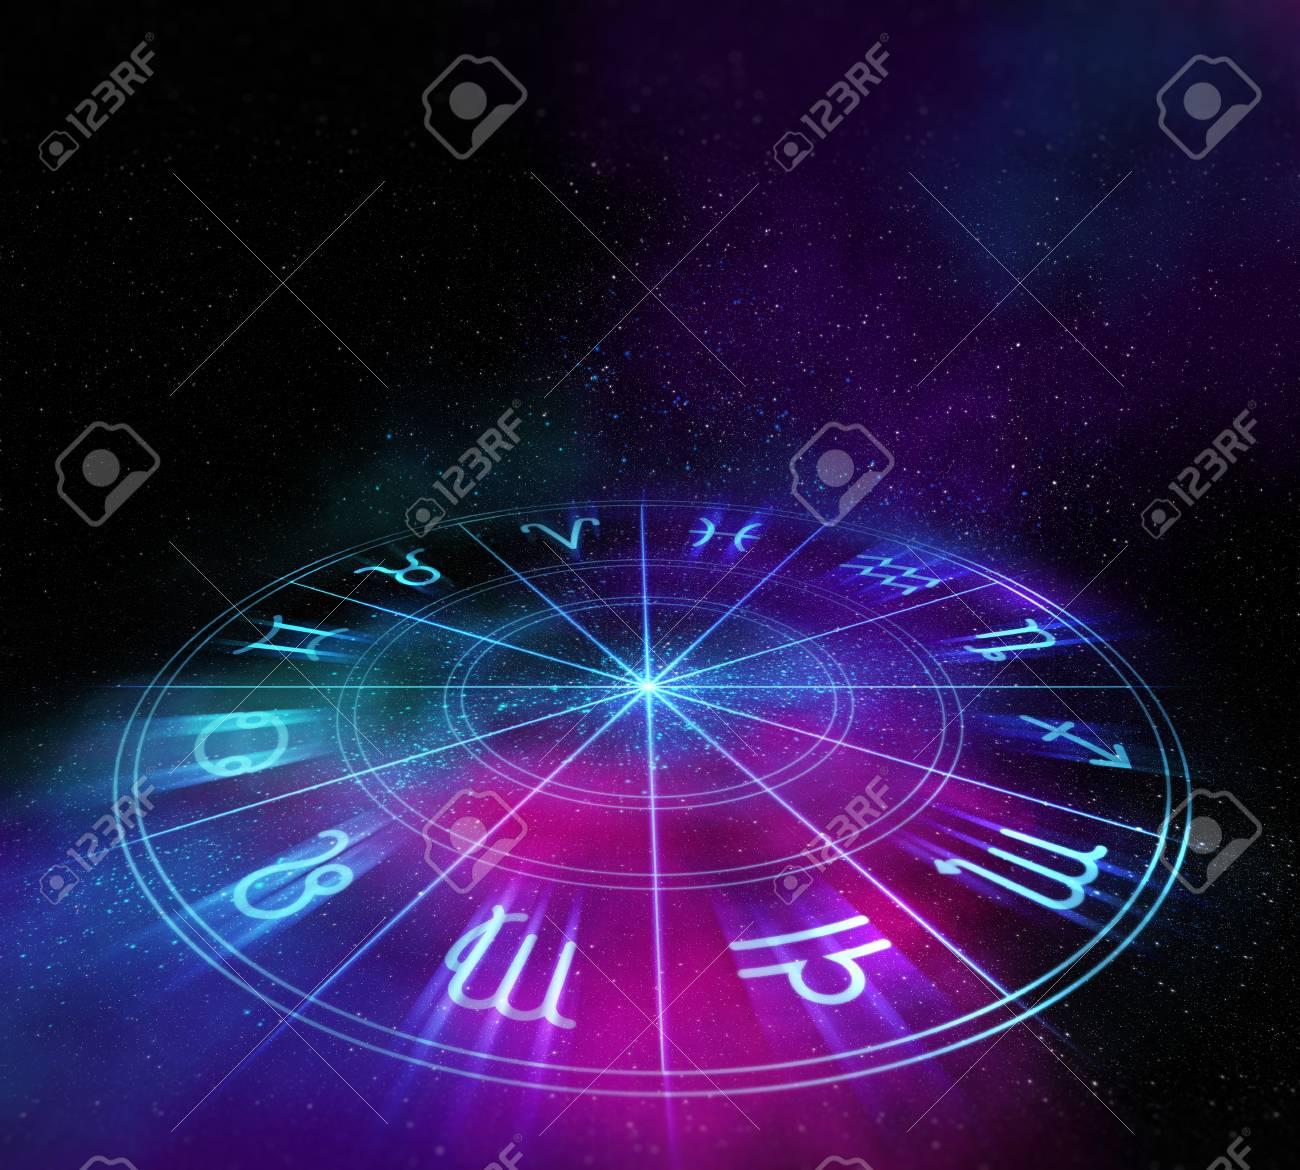 Backdrop design of sacred zodiac symbols signs geometry and backdrop design of sacred zodiac symbols signs geometry and designs represent concept of astrology biocorpaavc Choice Image